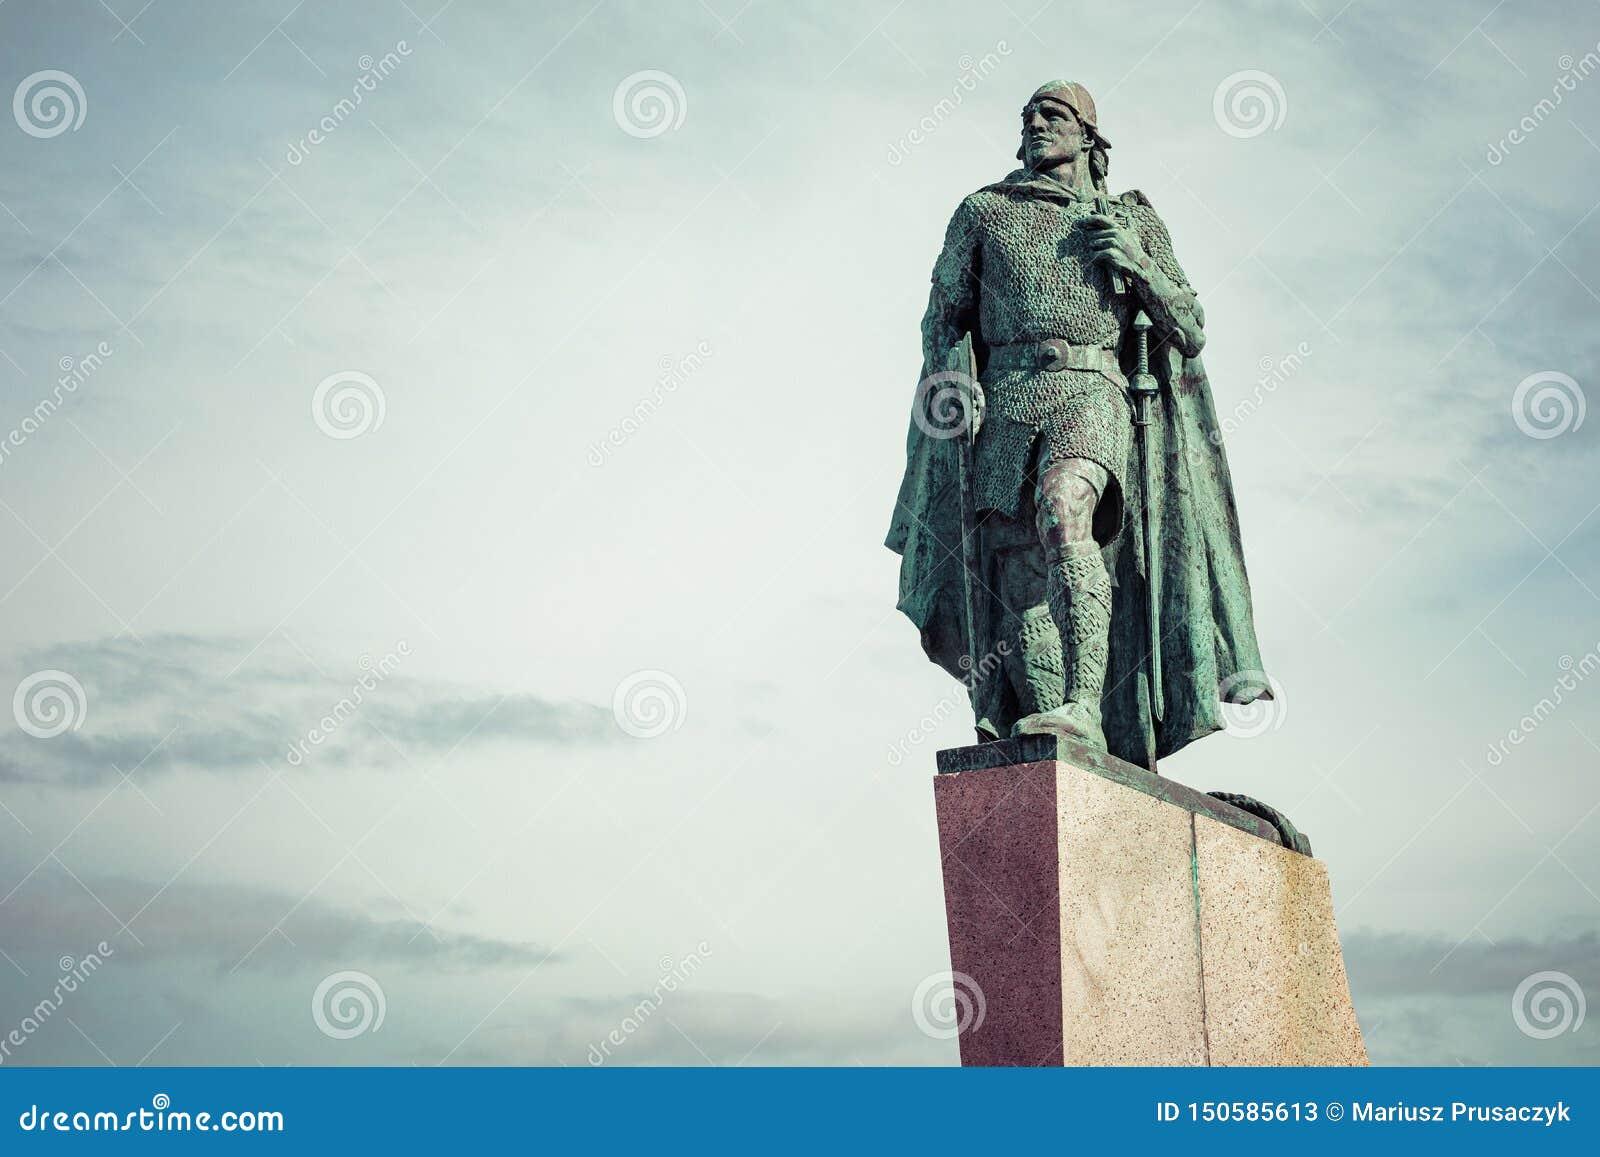 Statue of Leifur Eiriksson in front of the Hallgrimskirkja cathedral in Reykjavik, Iceland